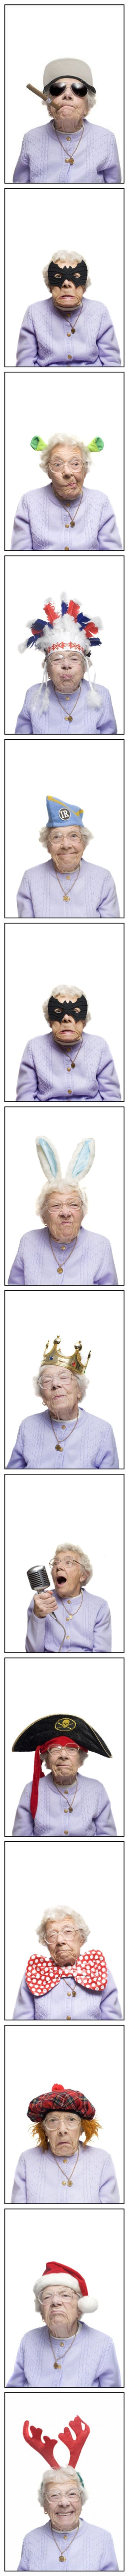 hahaha best grandma evvver!! so funny!